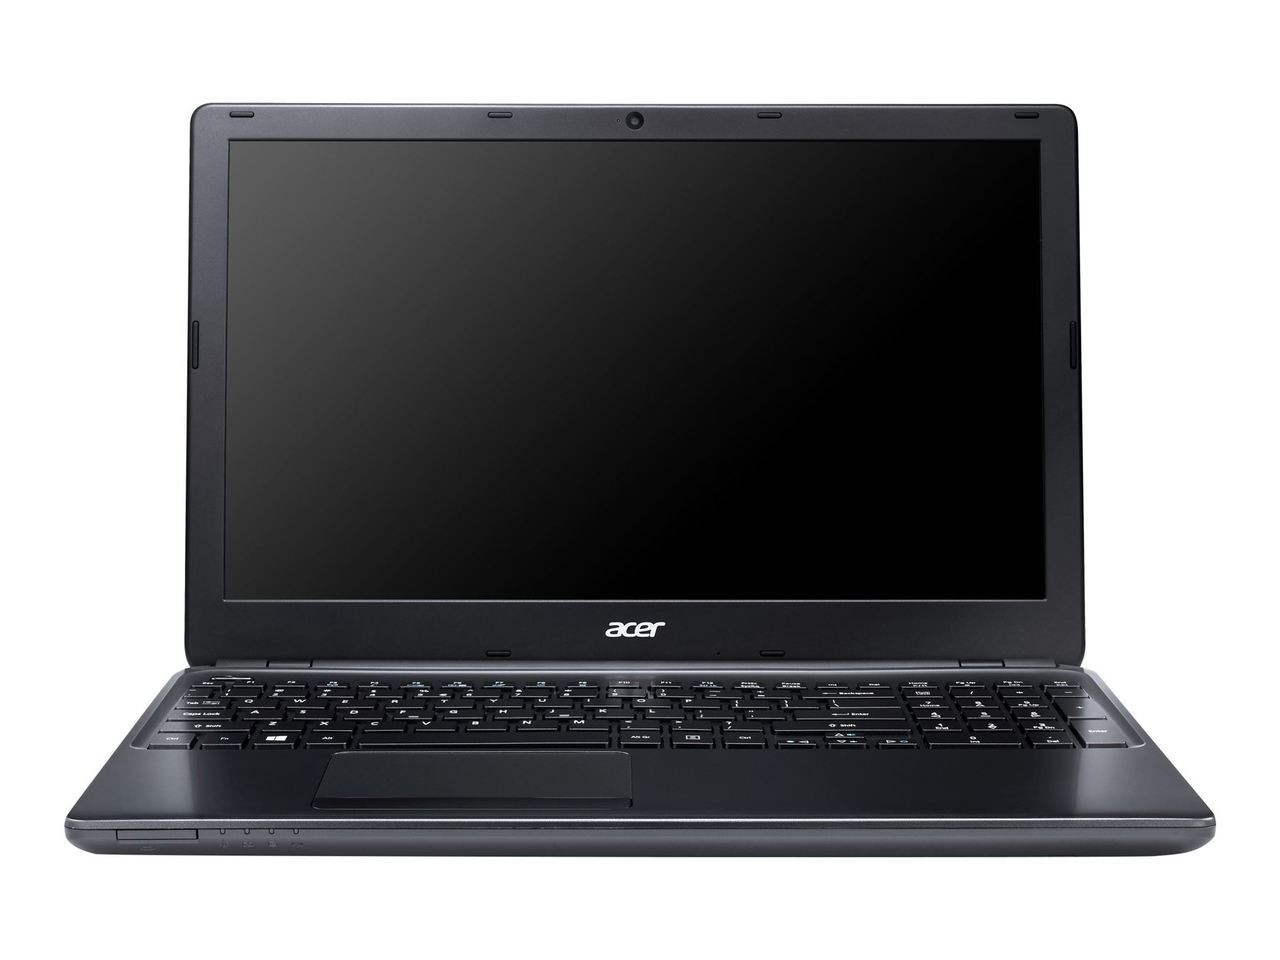 ACER ASPIRE E1-532 AMD GRAPHICS DRIVERS FOR WINDOWS MAC